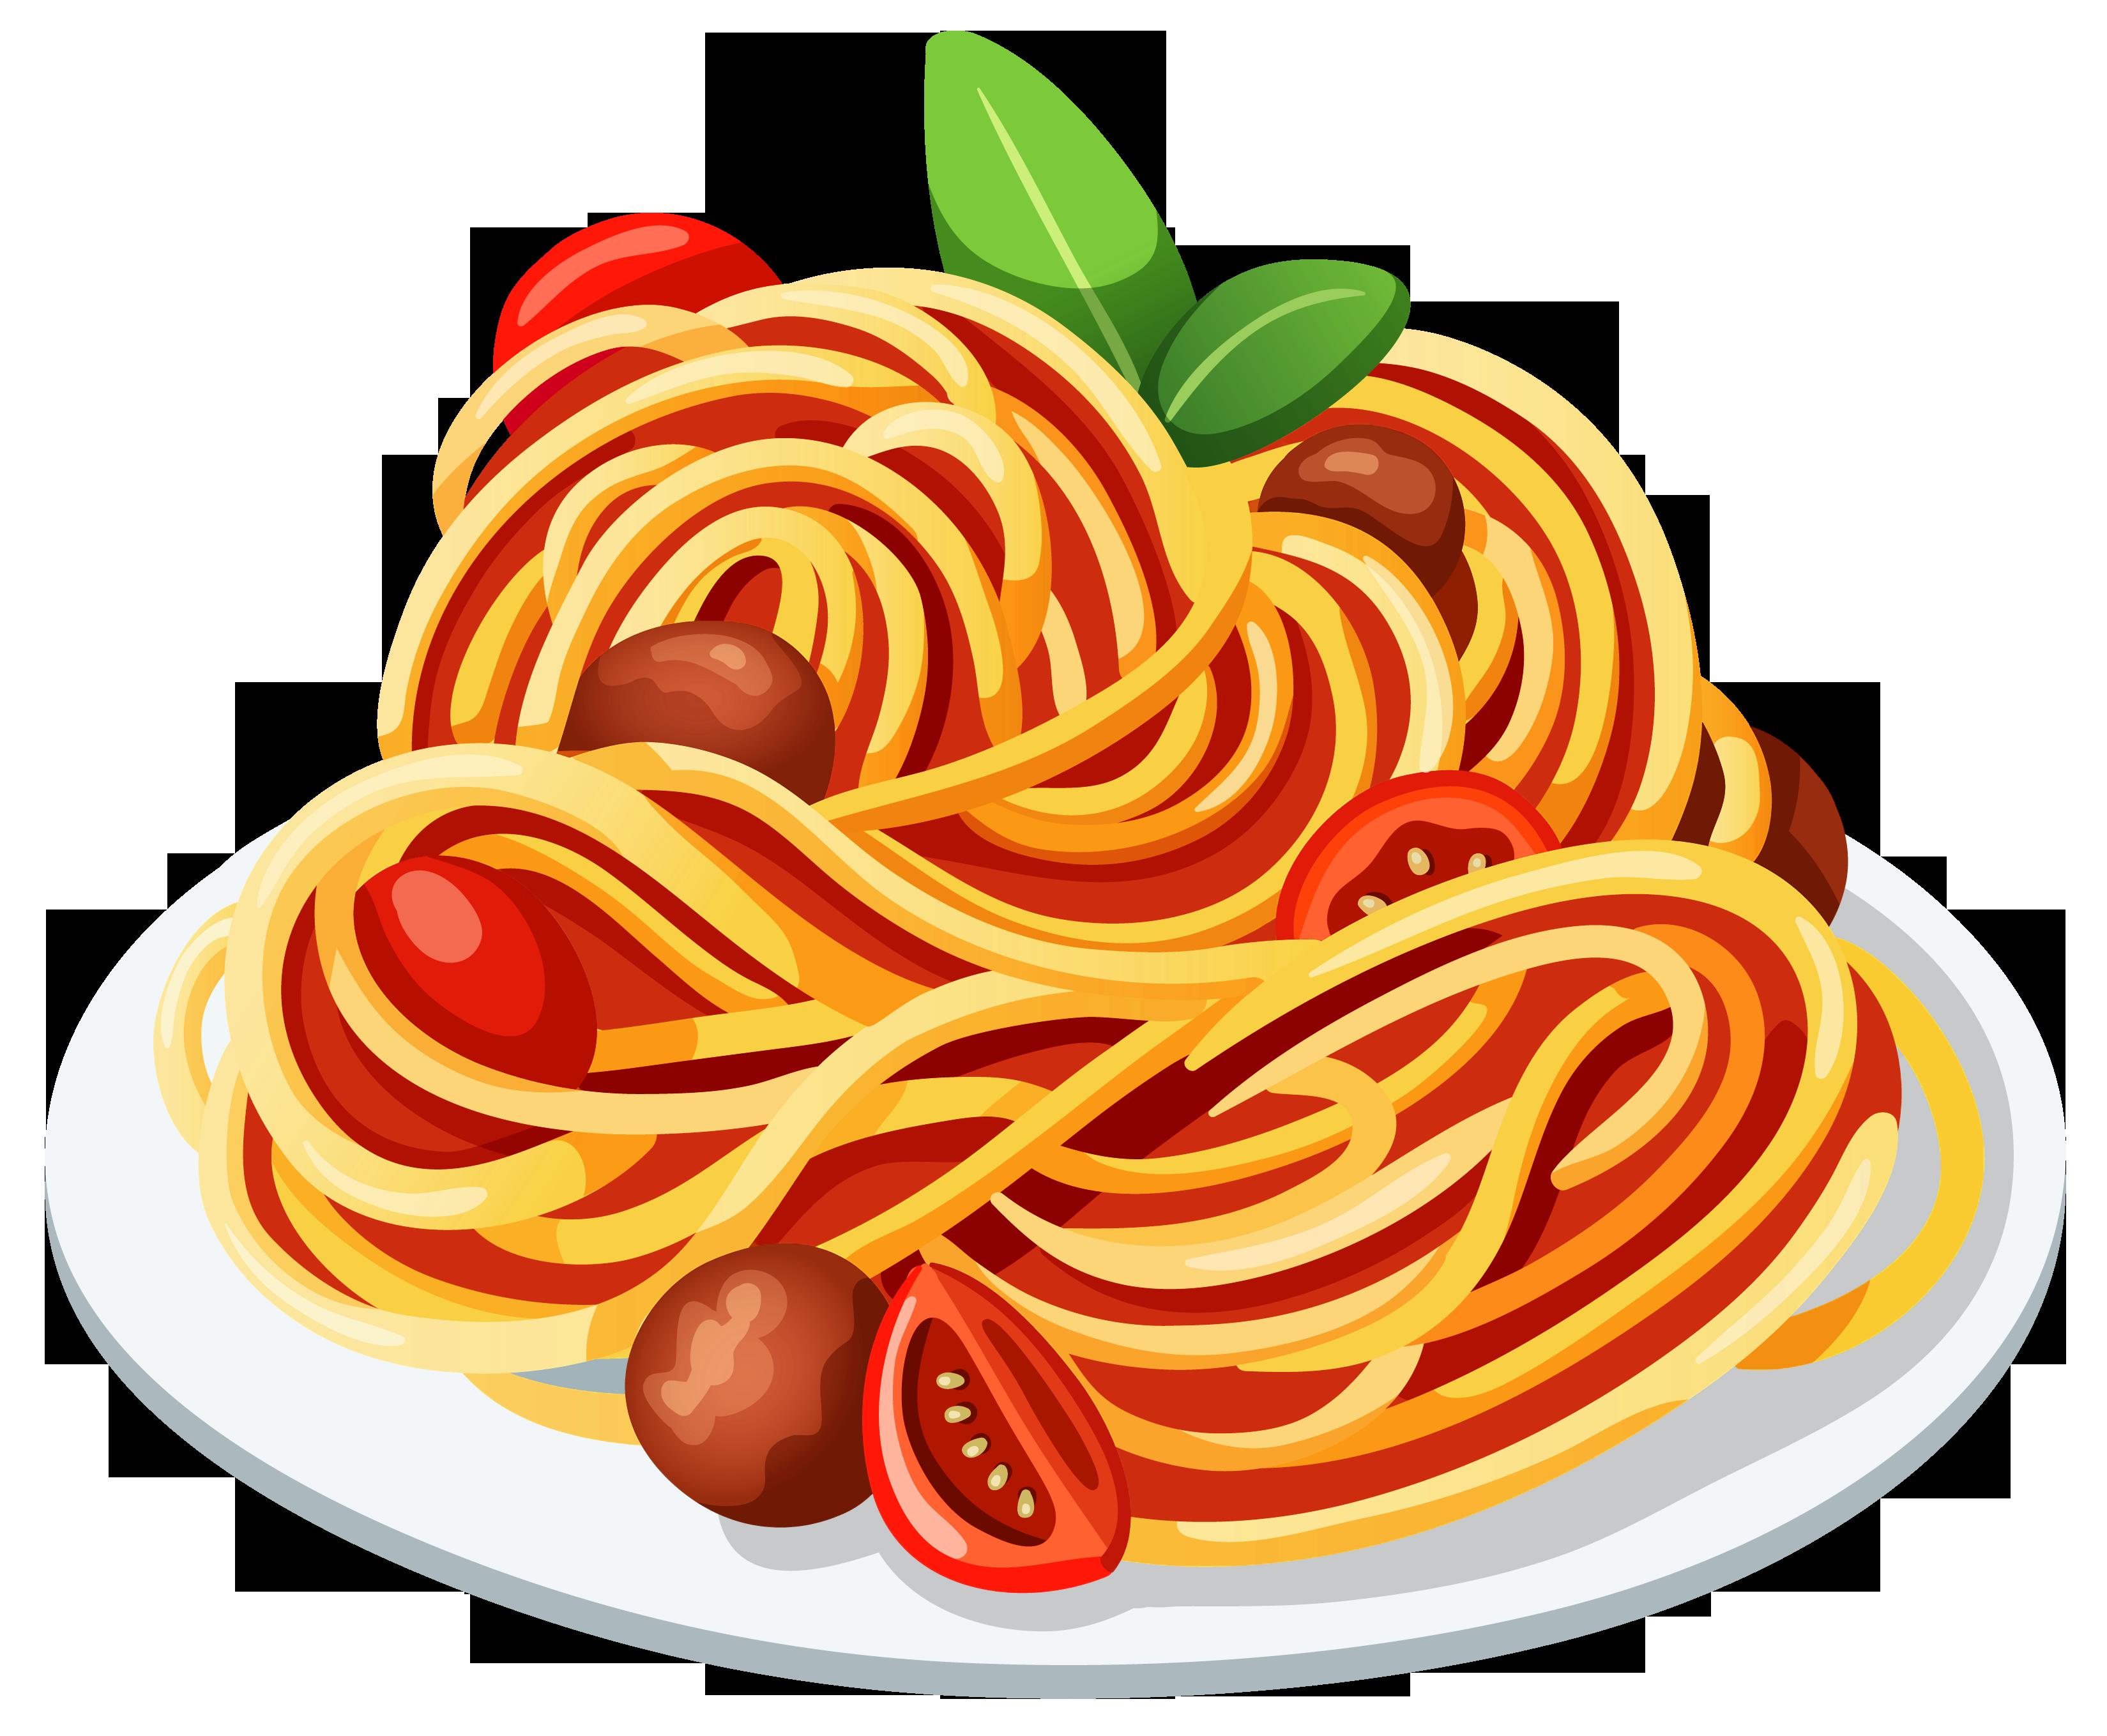 Pasta clipart free download jpg transparent download Spaghetti pasta clipart free images jpg - Clipartix jpg transparent download